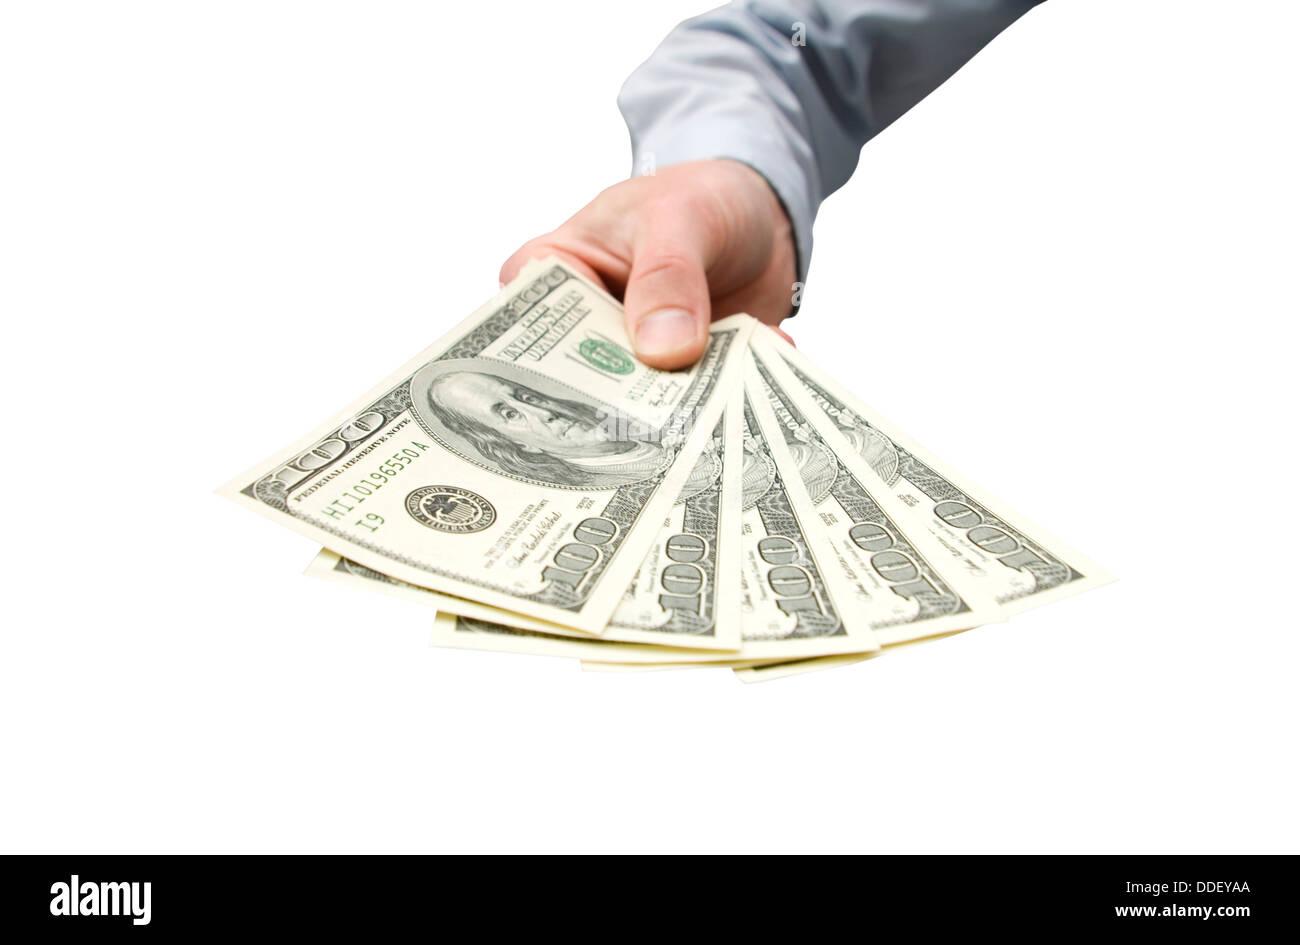 dollars - Stock Image